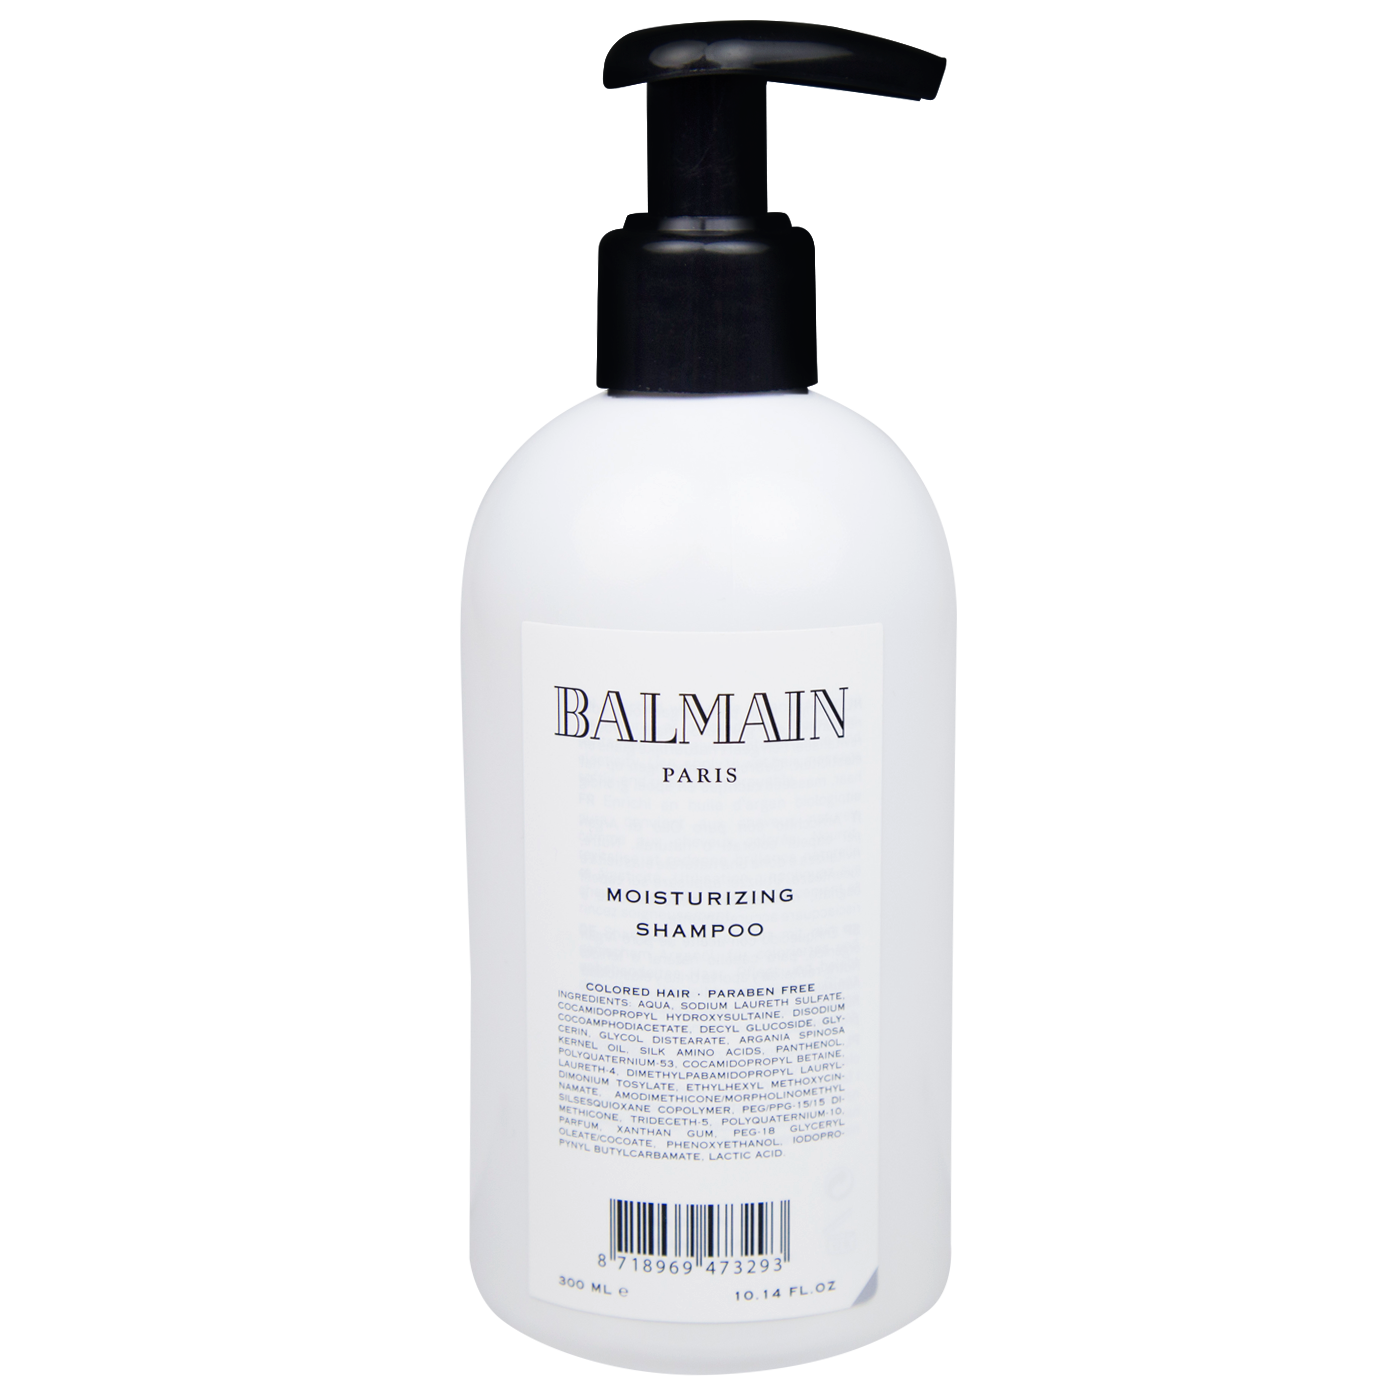 Balmain Moisturizing Shampoo 300 ml   Shampoo Hidratante